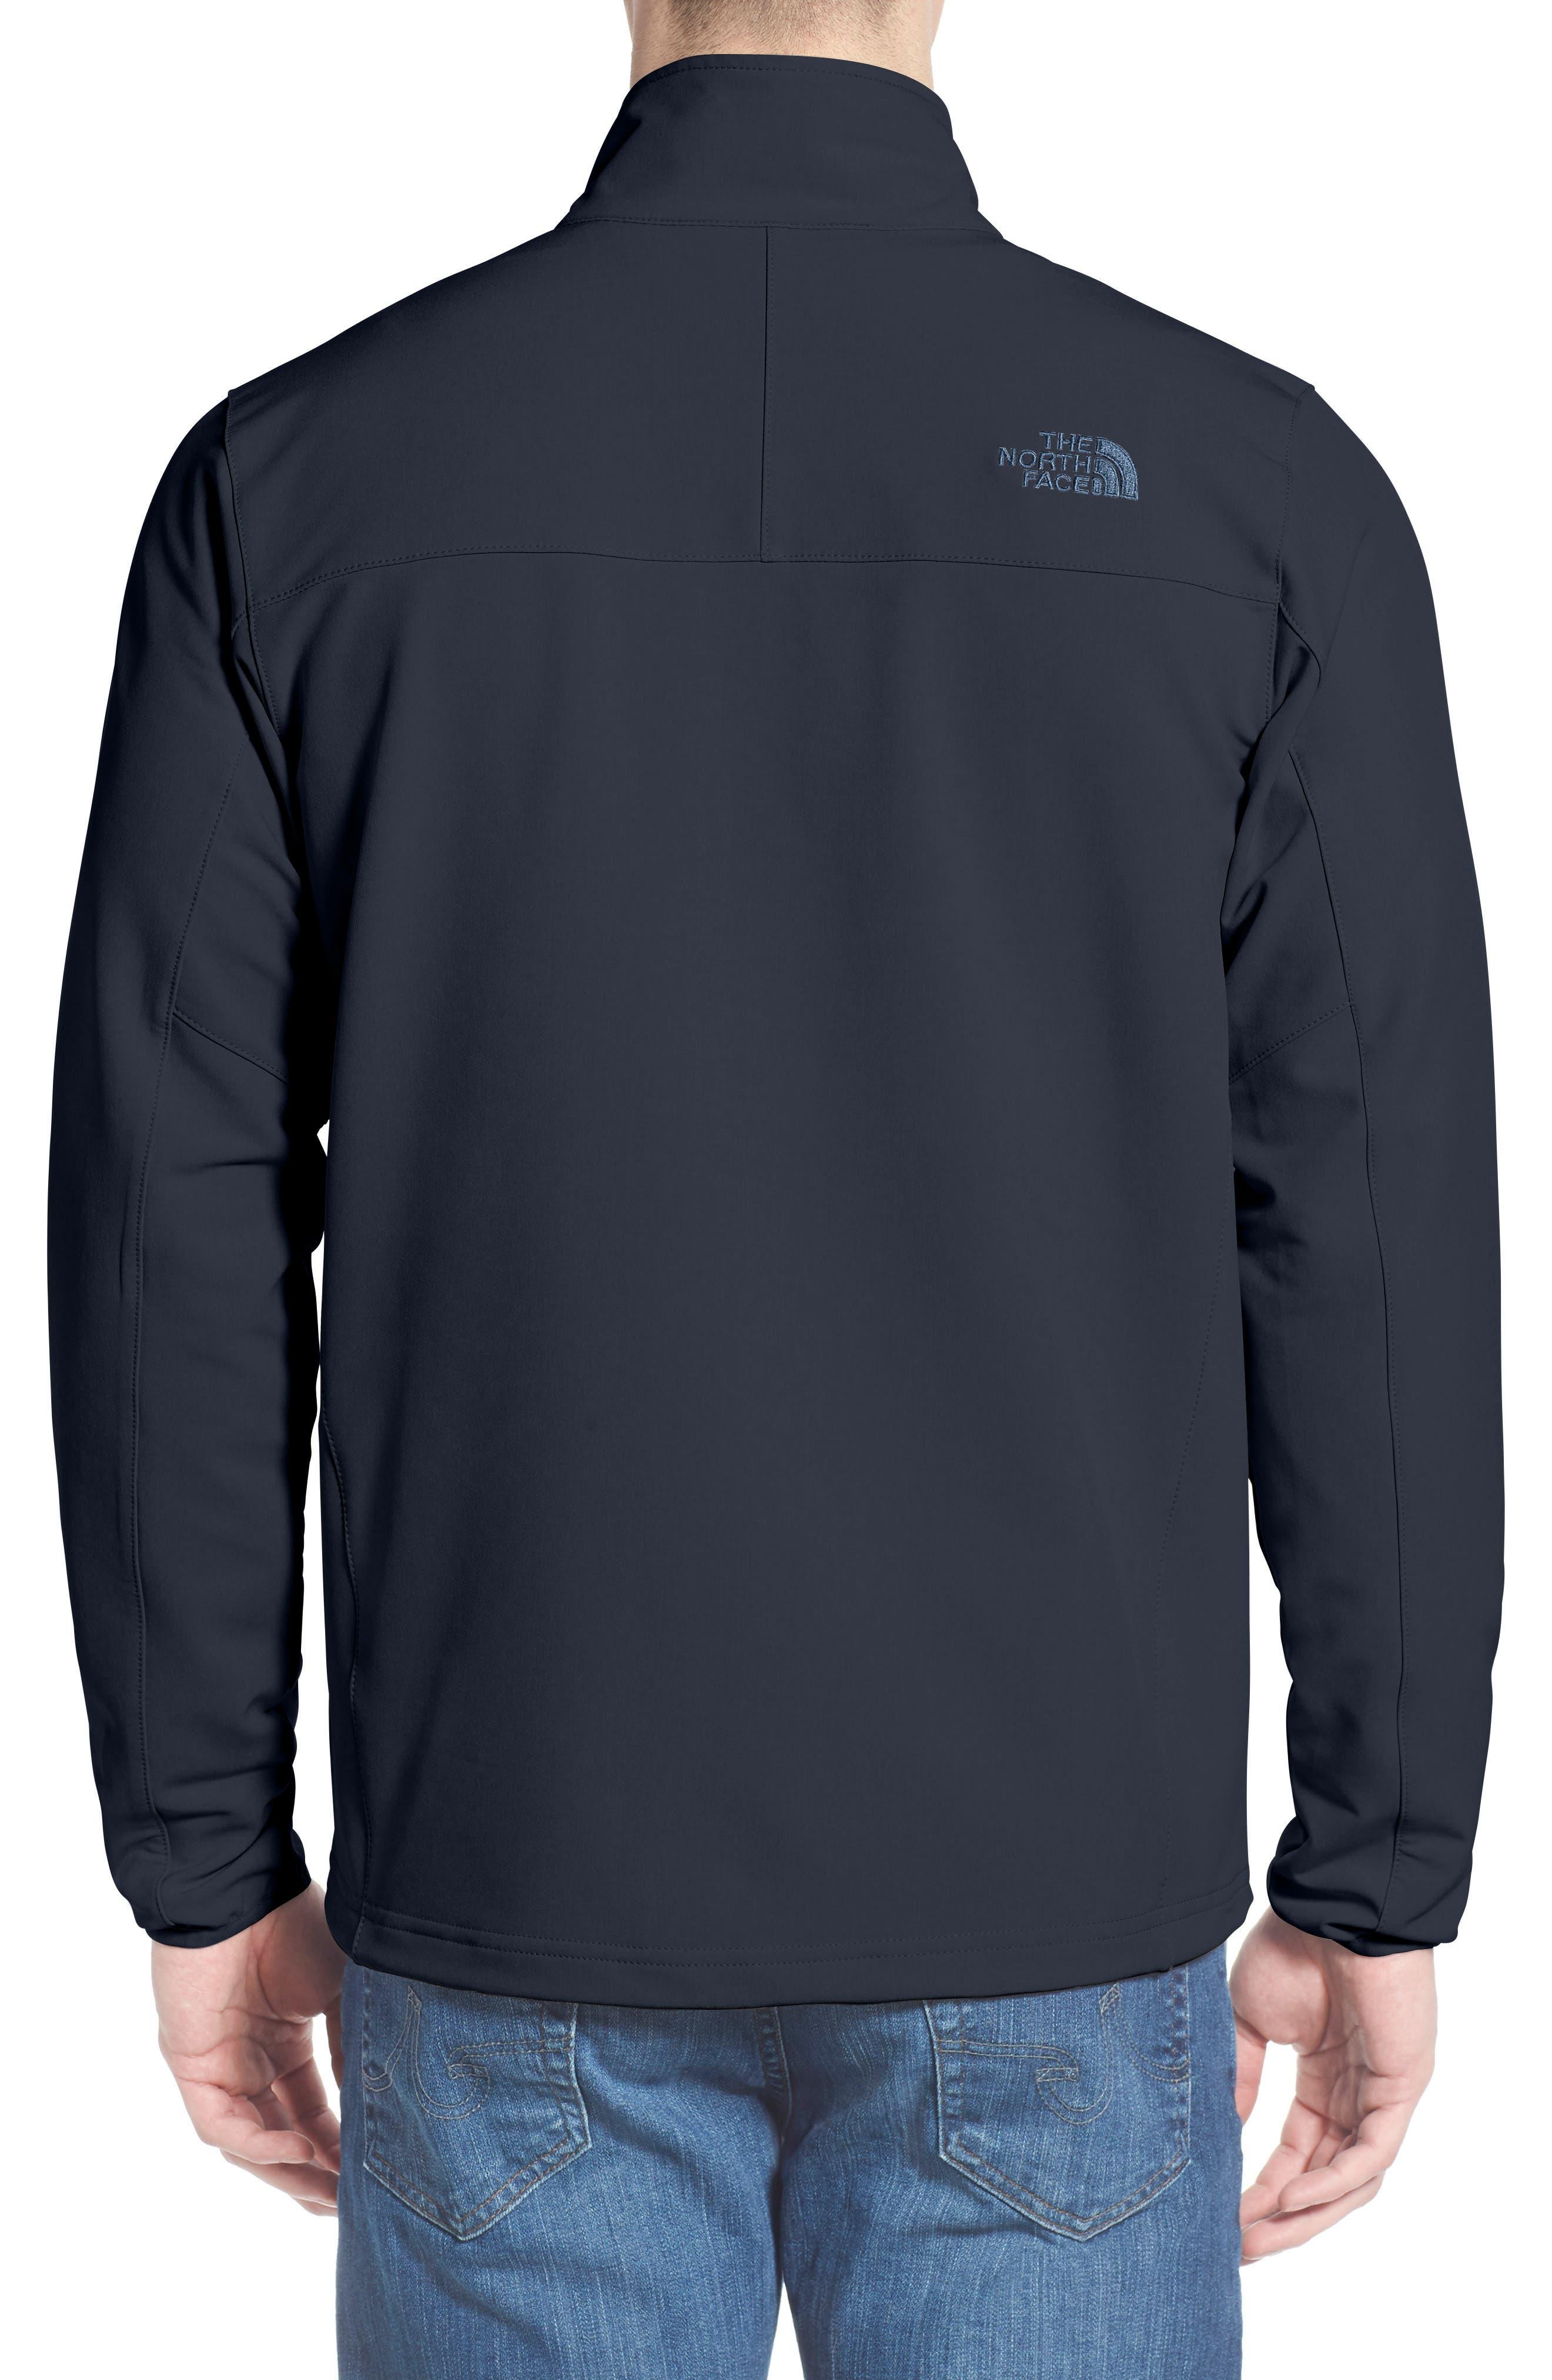 Apex Pneumatic Jacket,                         Main,                         color, 425